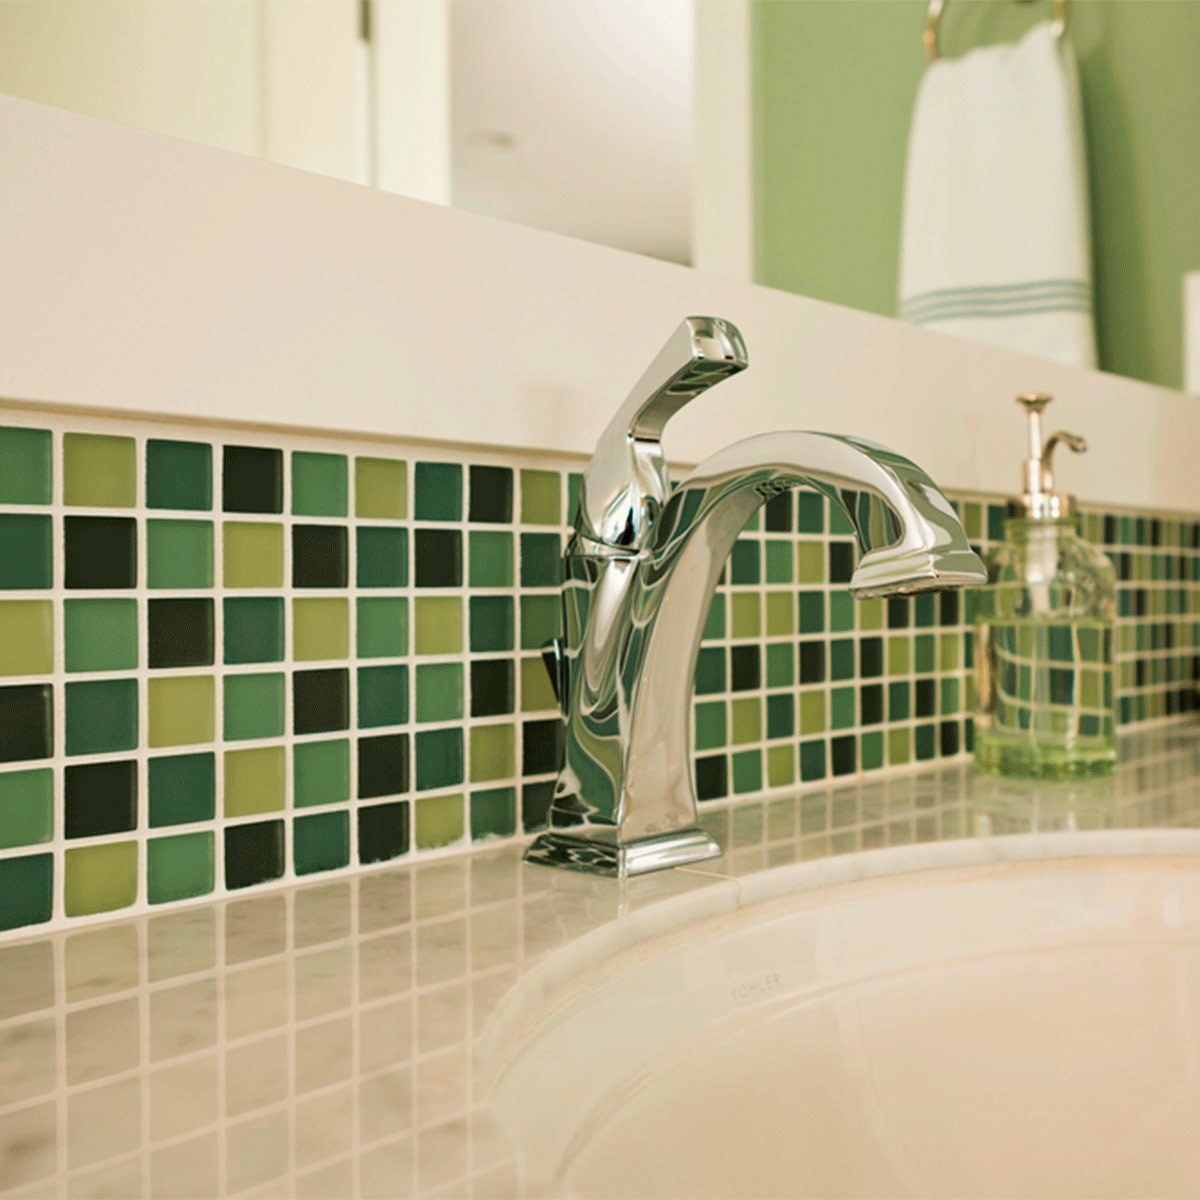 Tile a Green Border in the Bathroom